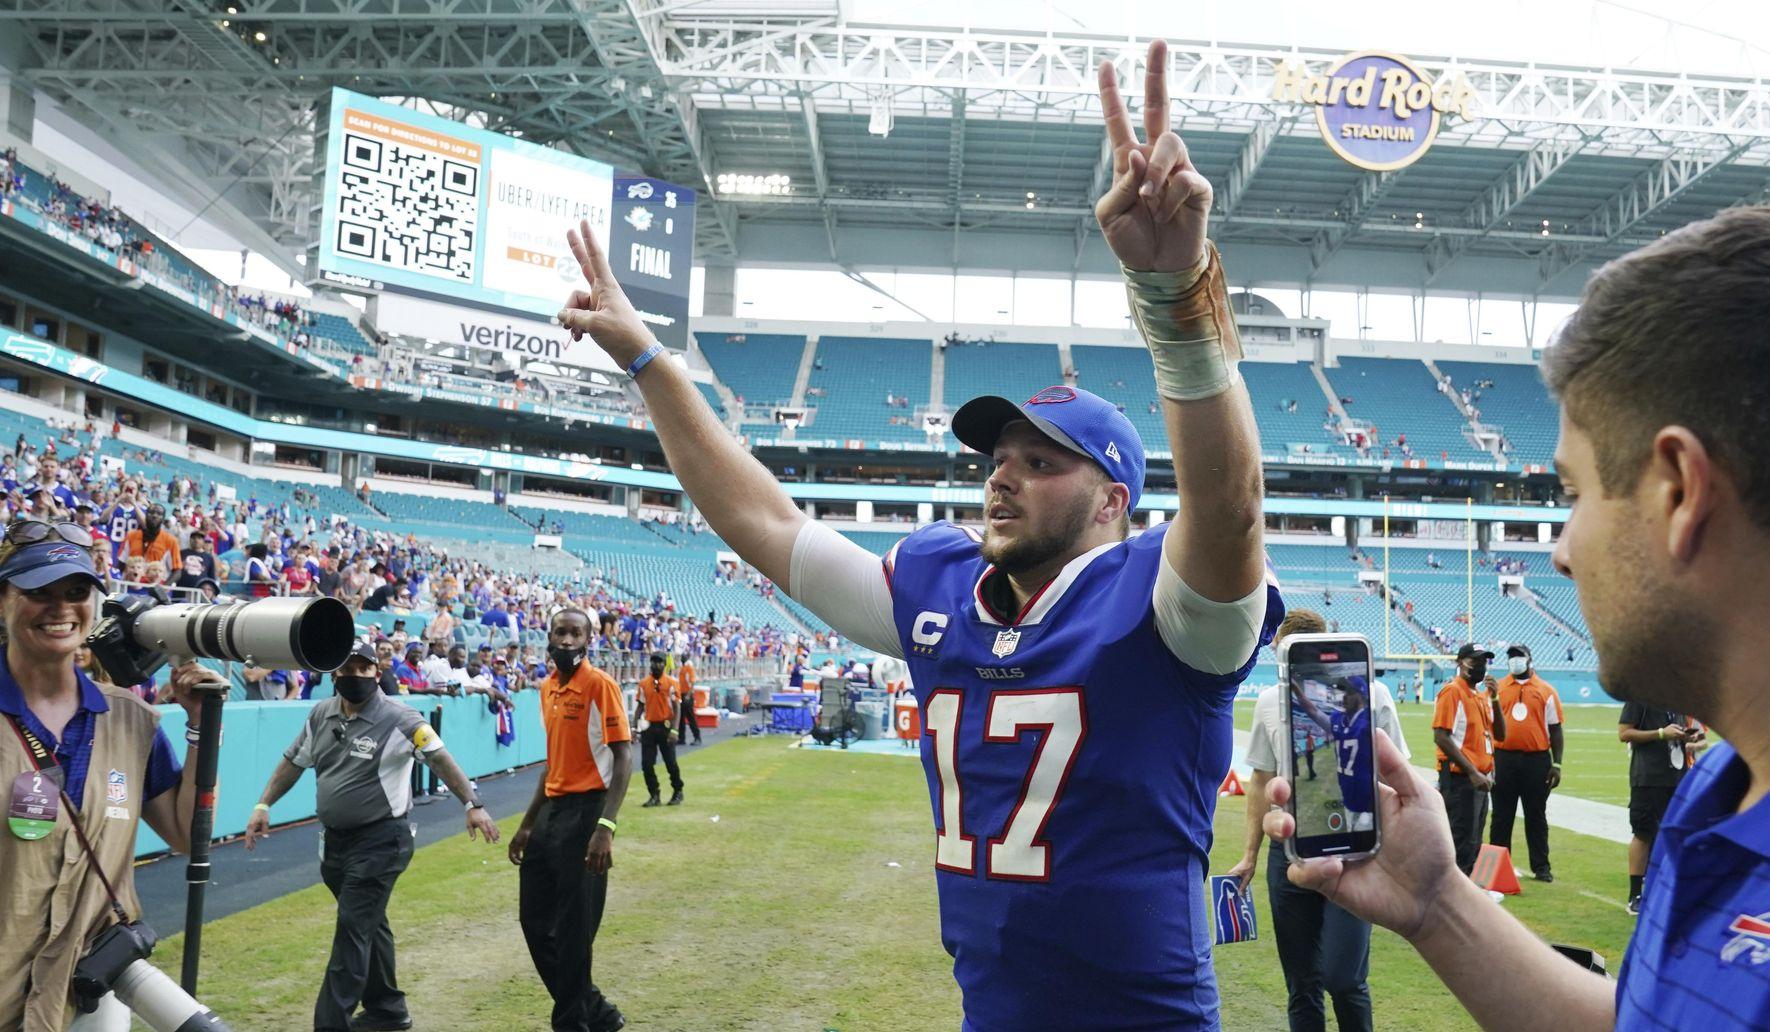 Bills_dolphins_football_41204_c0-0-4730-2757_s1770x1032